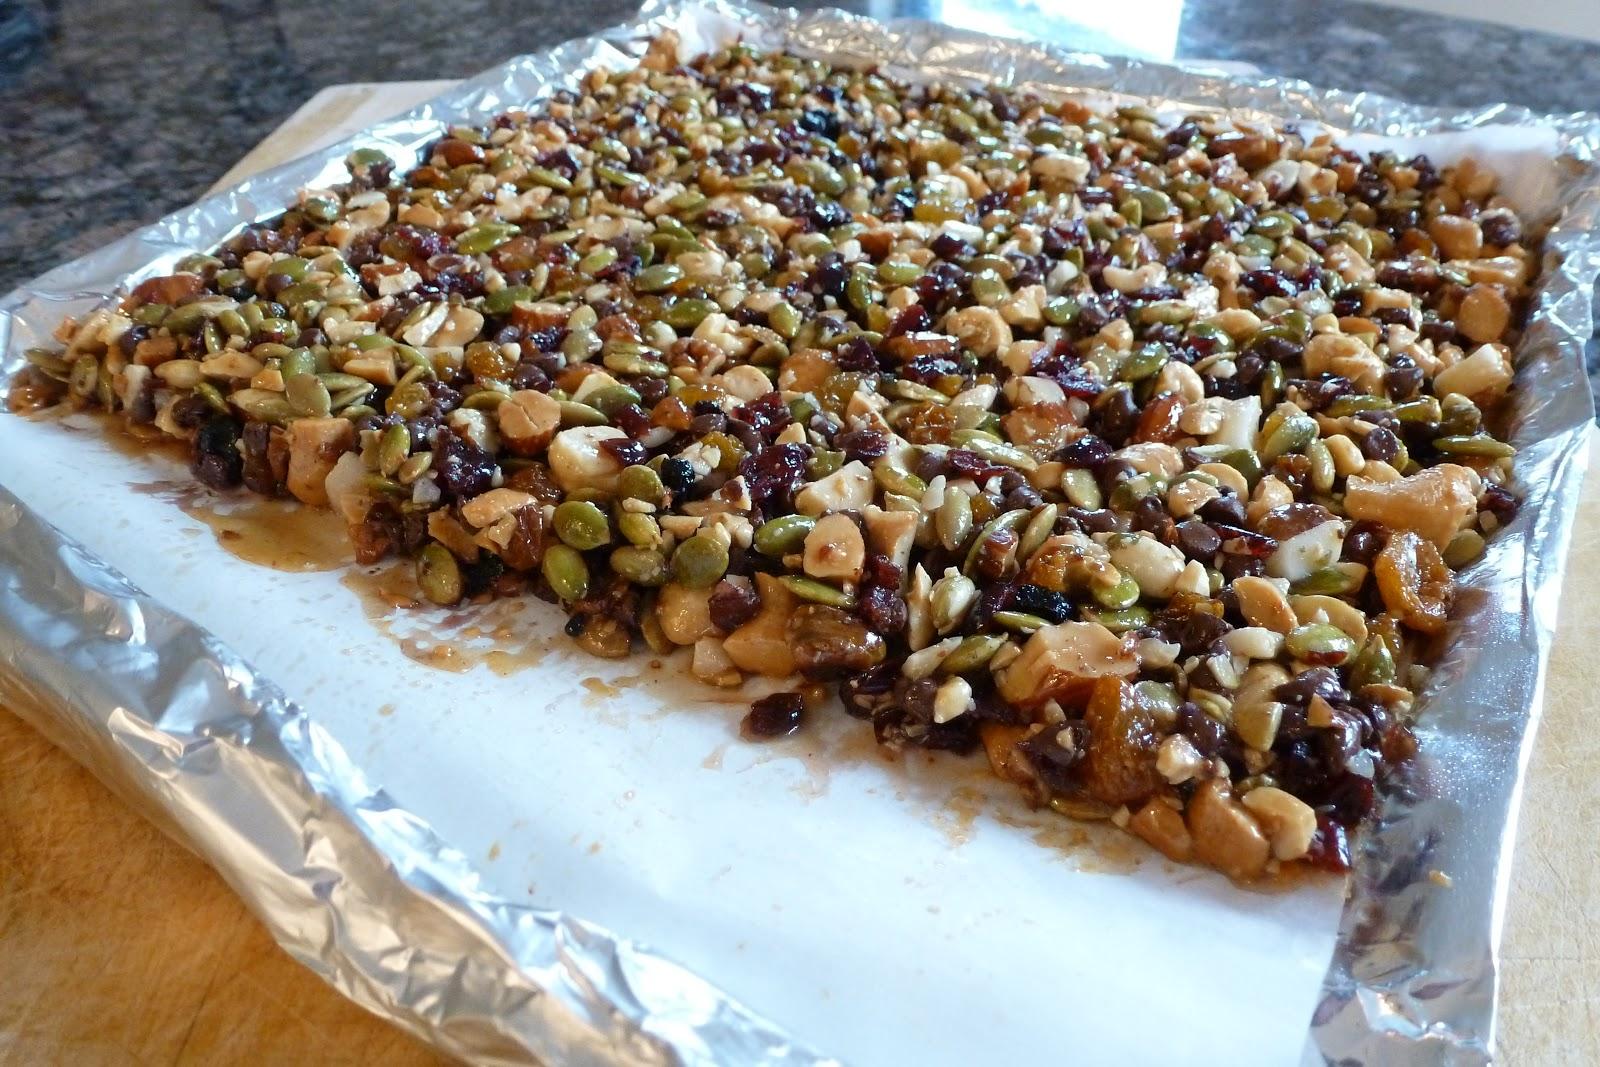 Homemade Fruit and Nut Bars | A Balaced Palate